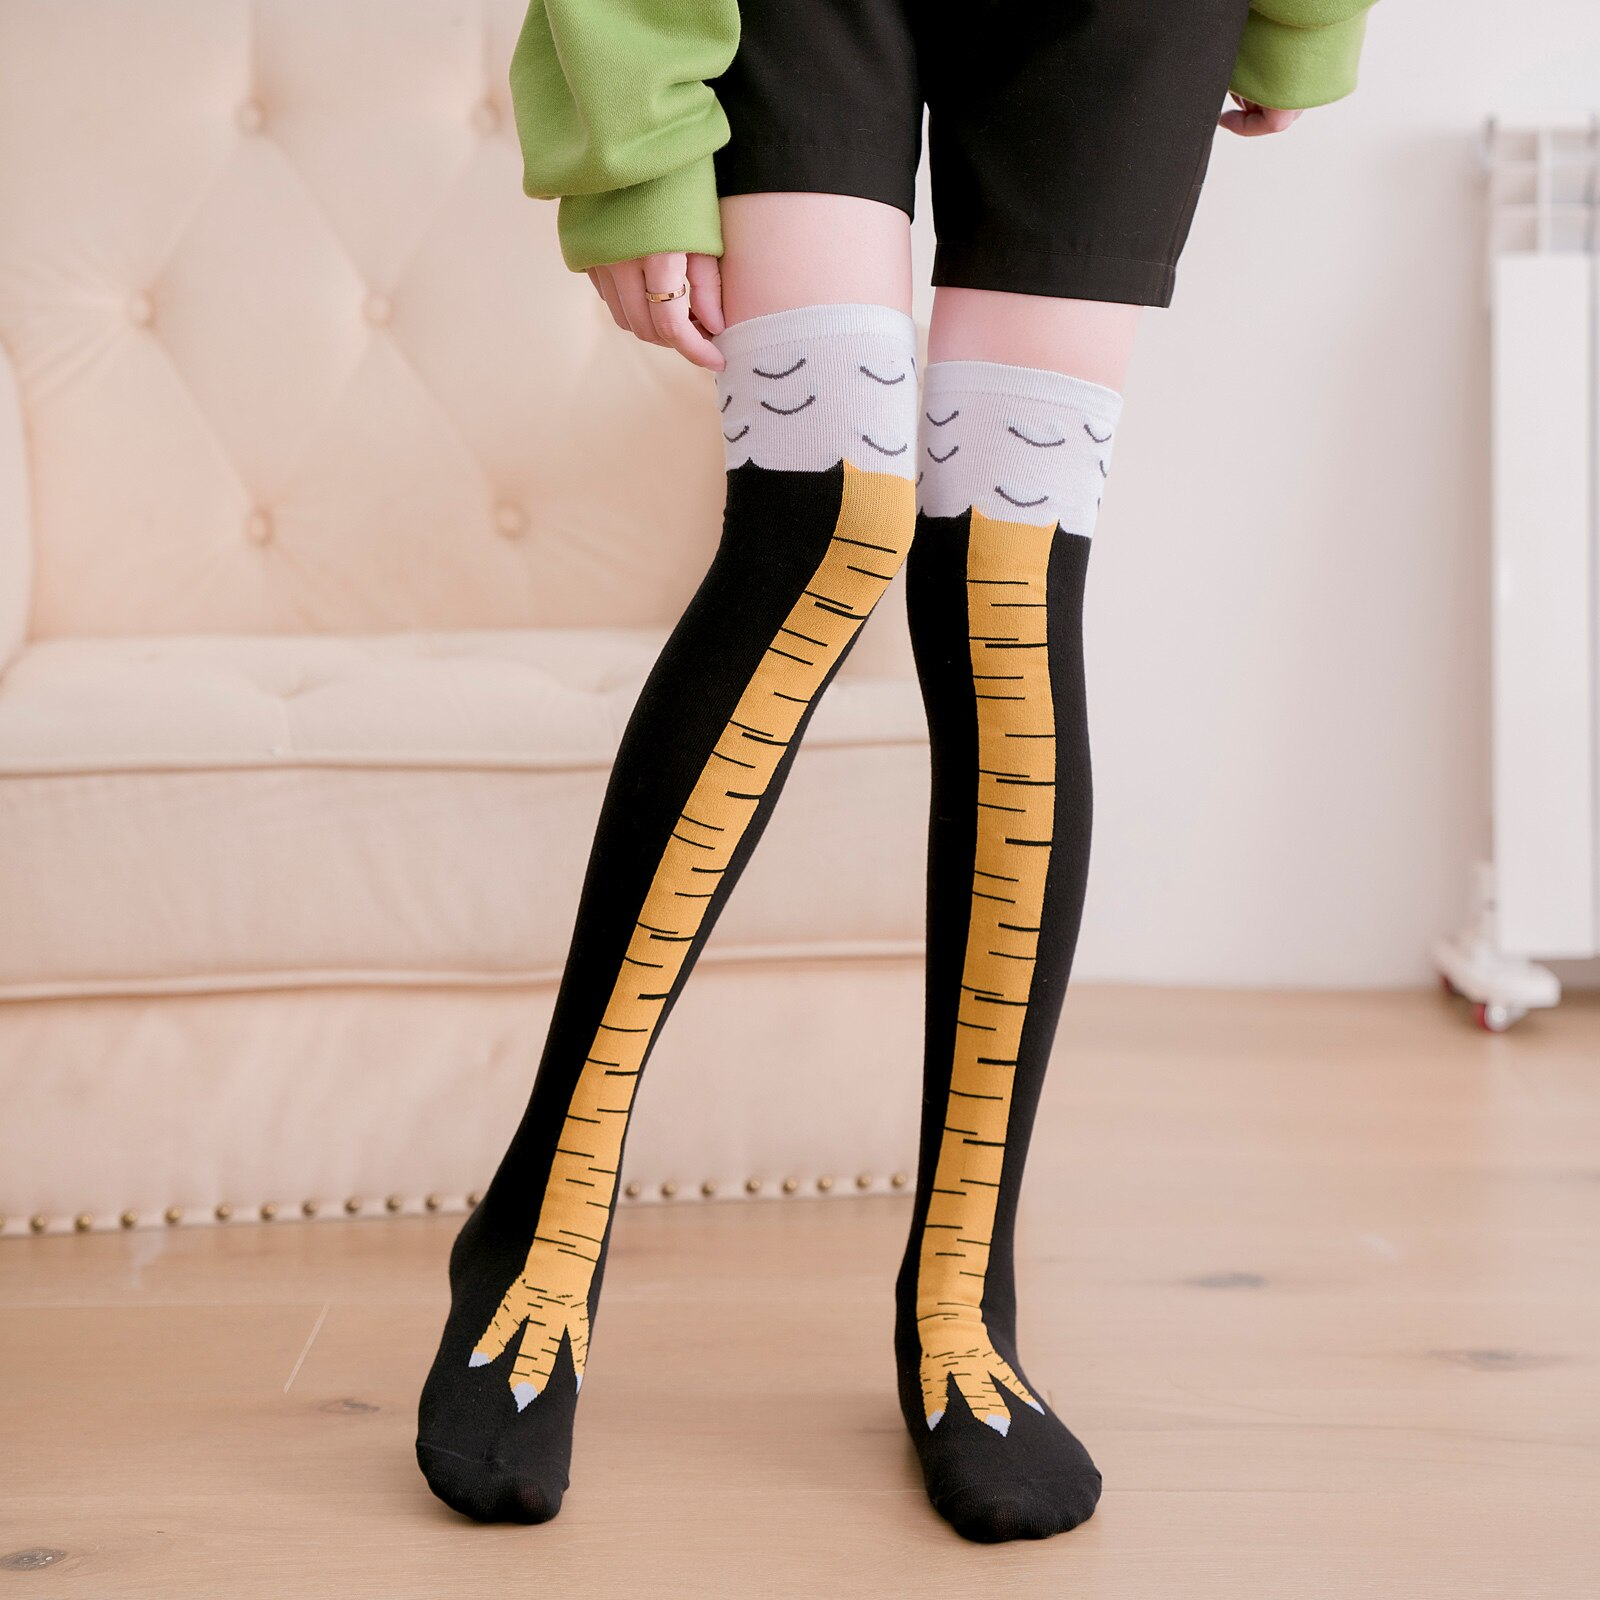 Chicken Feet Patterned Knee Socks 1 Pair 80% Cotton 19% Polyemide 1% Elastane 37-44 Size носки Socks Funny Unisex Skarpety